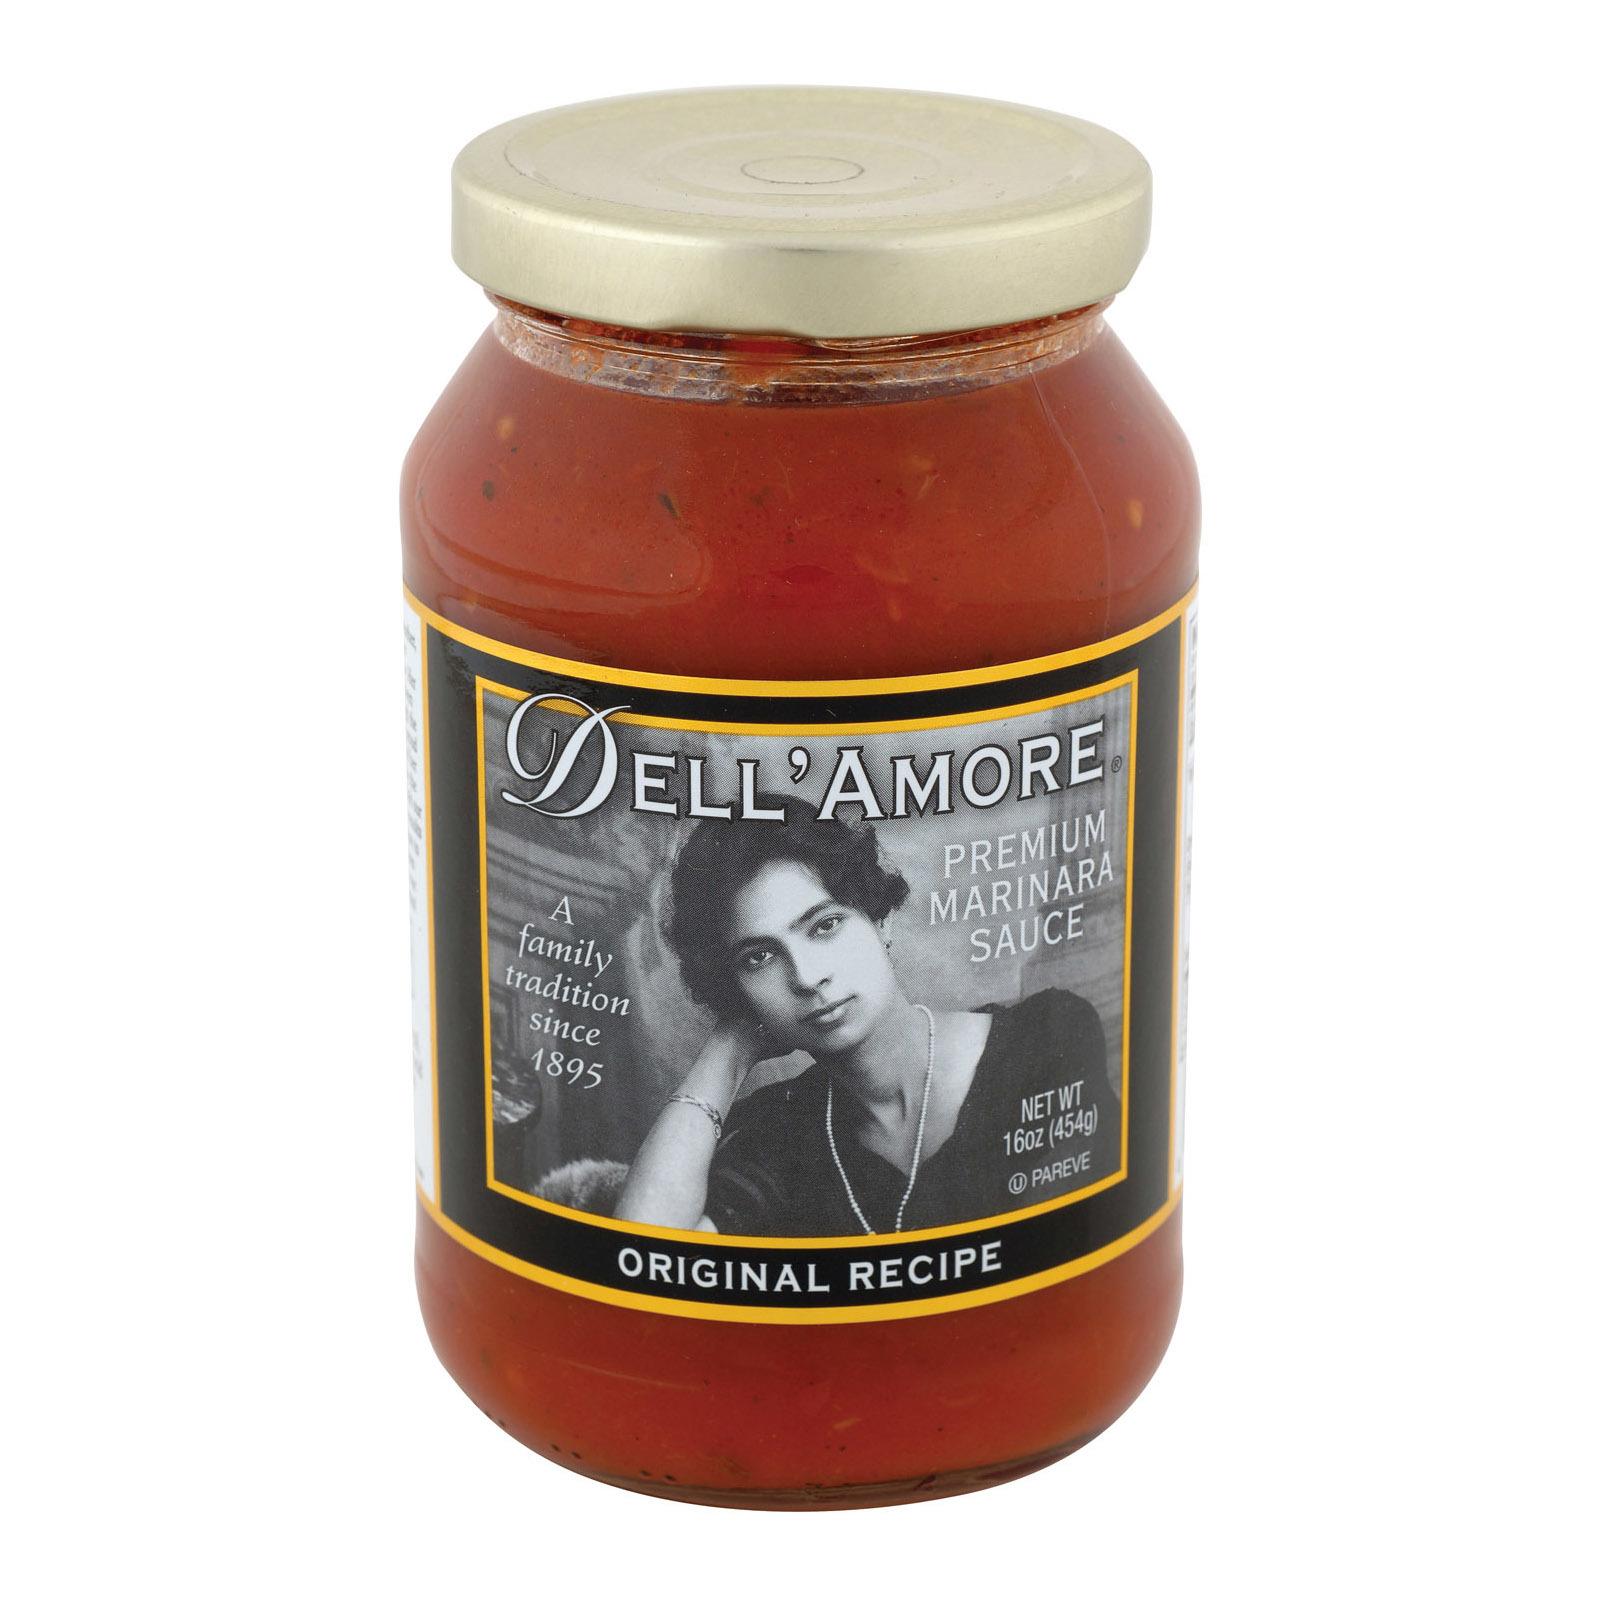 Dell Amore Original Marinara Sauce - Case of 12 - 16 fl oz